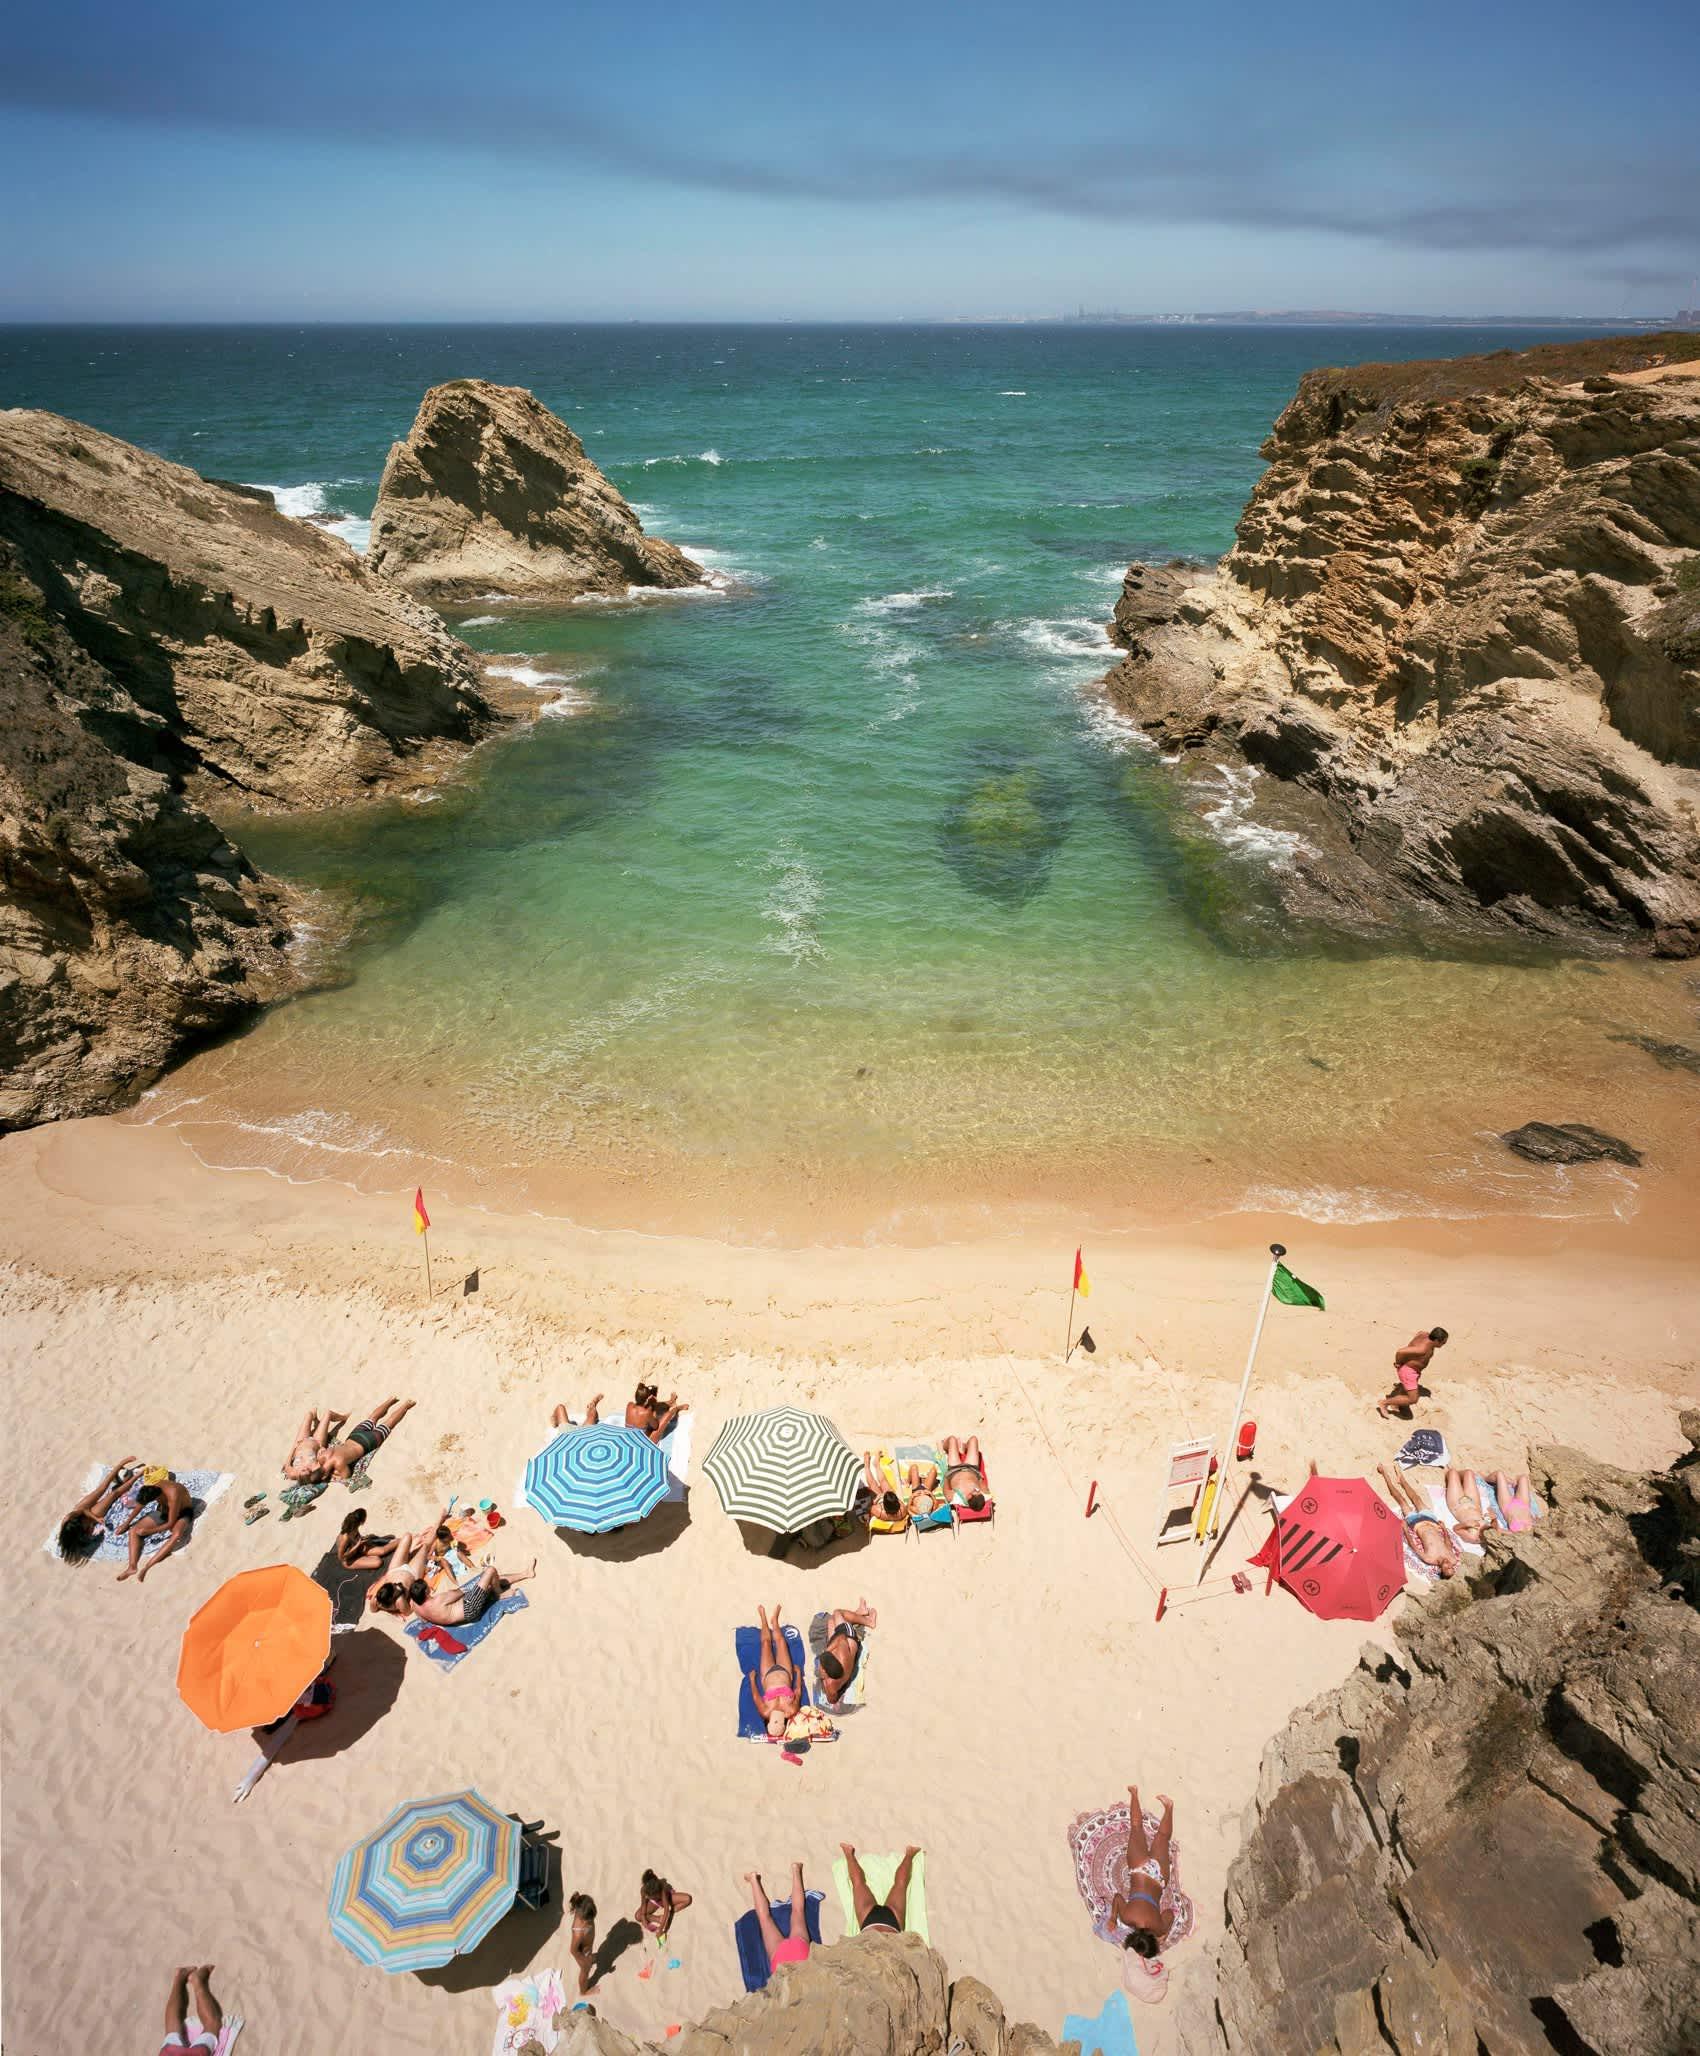 Online Viewing Room: Christian Chaize, Praia Piquinia, August 6 - August 13, 2020